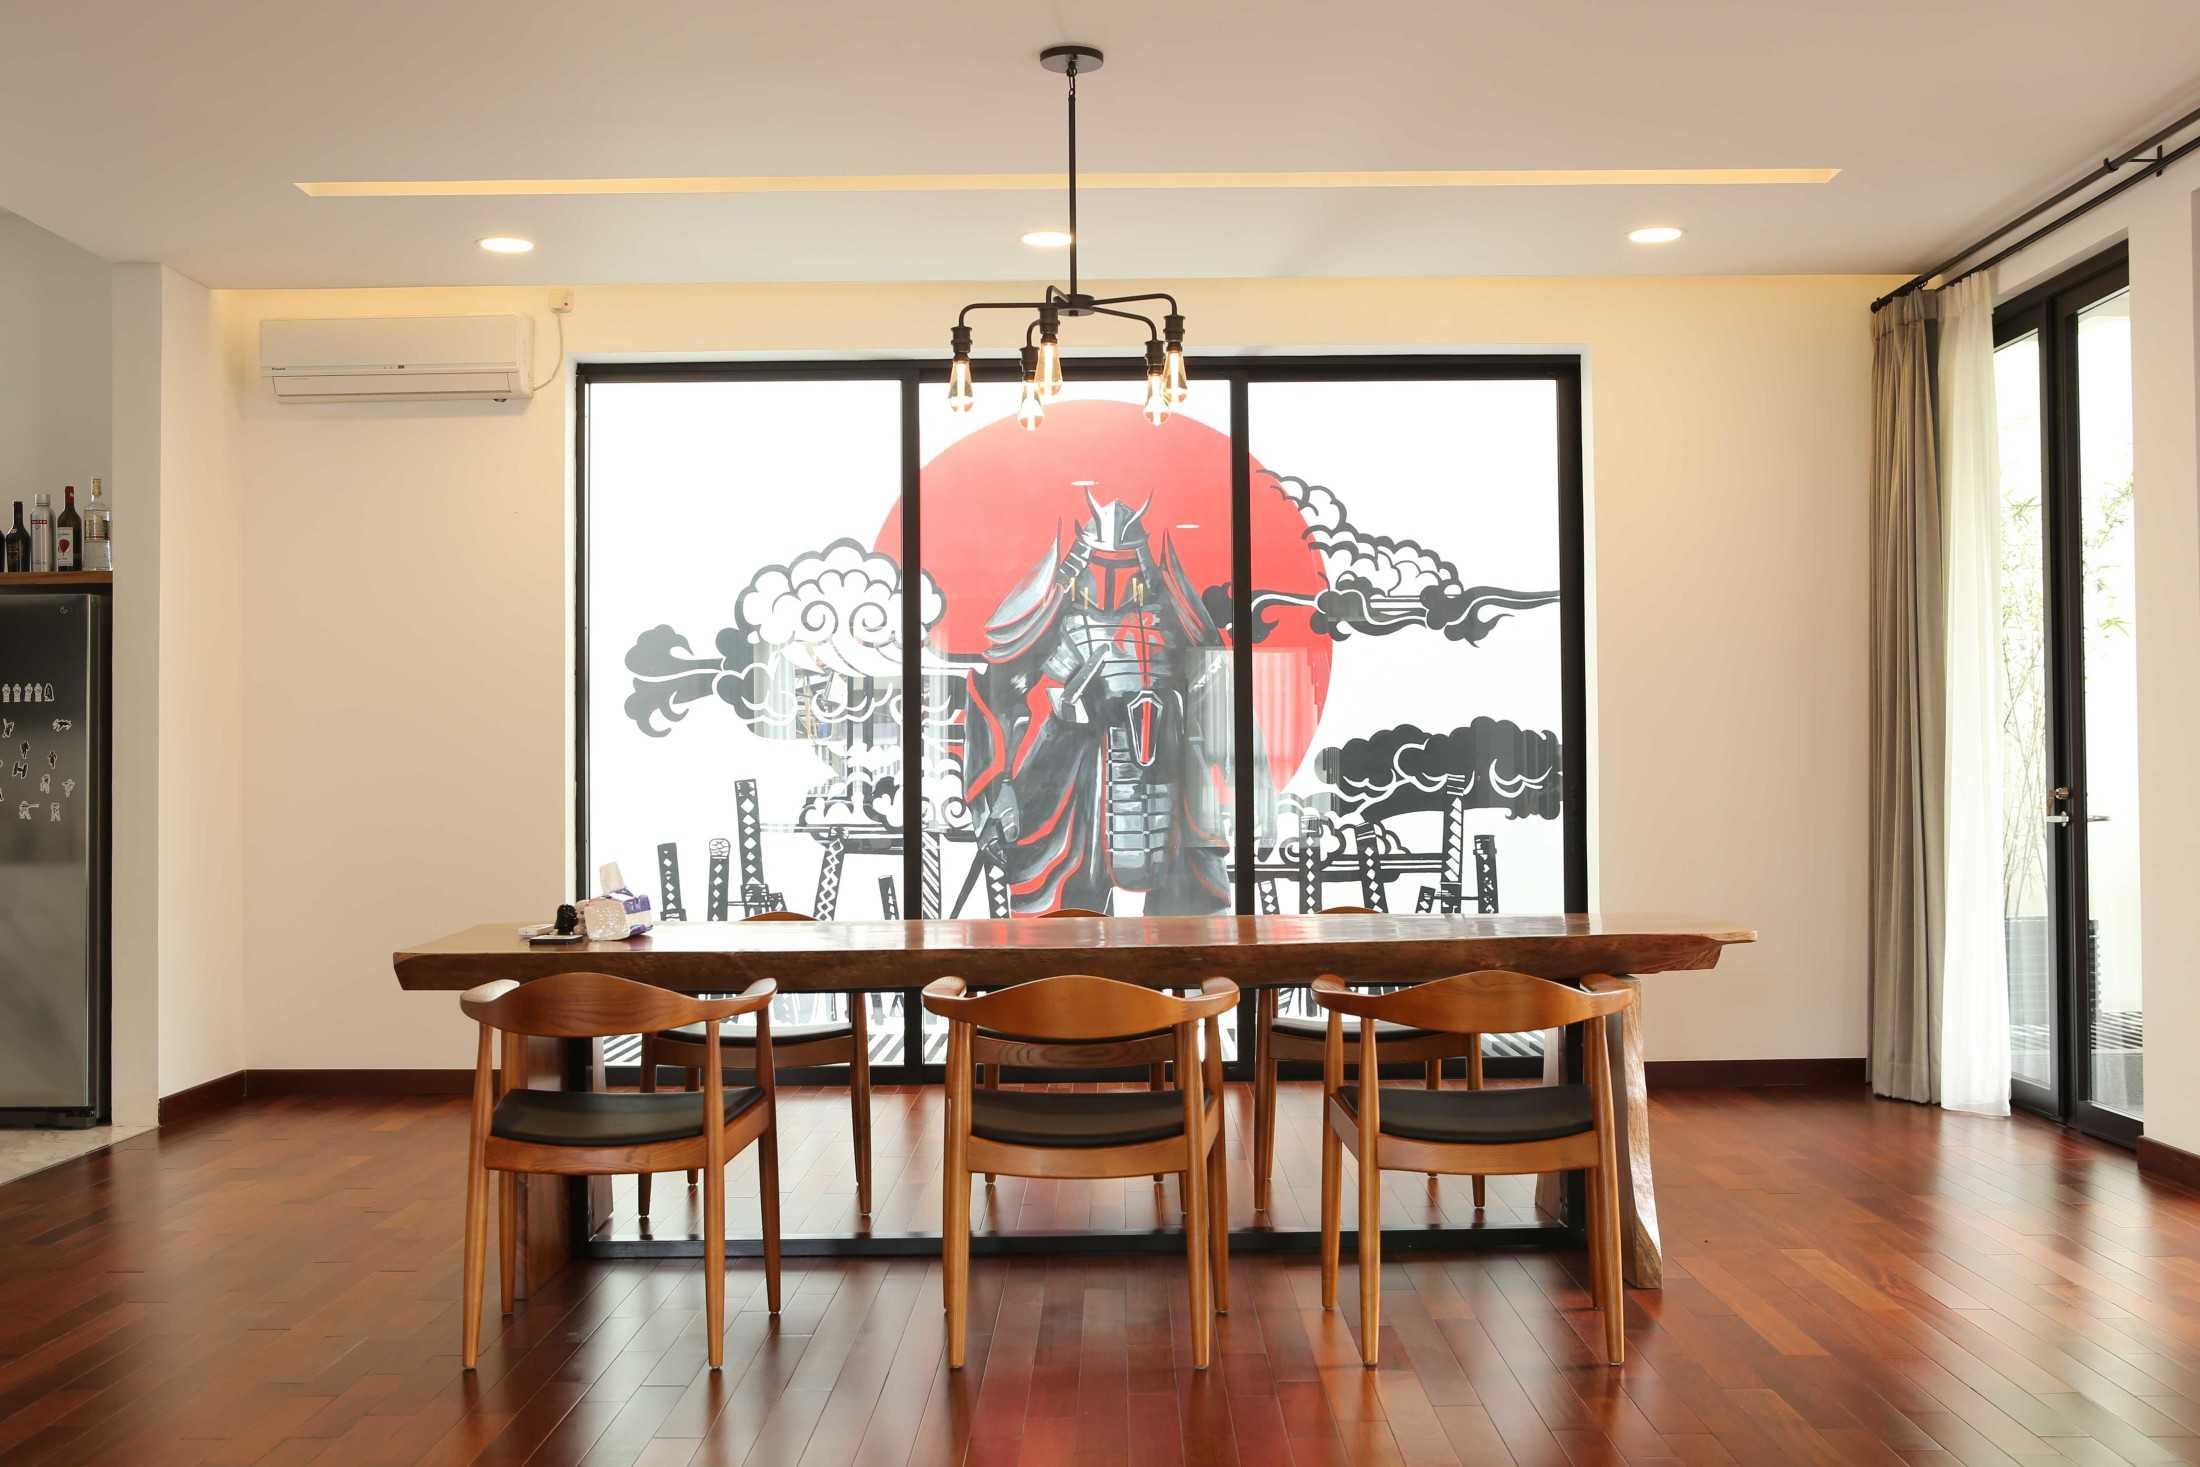 Home By Fabelio.com Dempo House Jakarta Selatan, Kota Jakarta Selatan, Daerah Khusus Ibukota Jakarta, Indonesia  Tanjung Duren's Villa Living Room Contemporary 53286